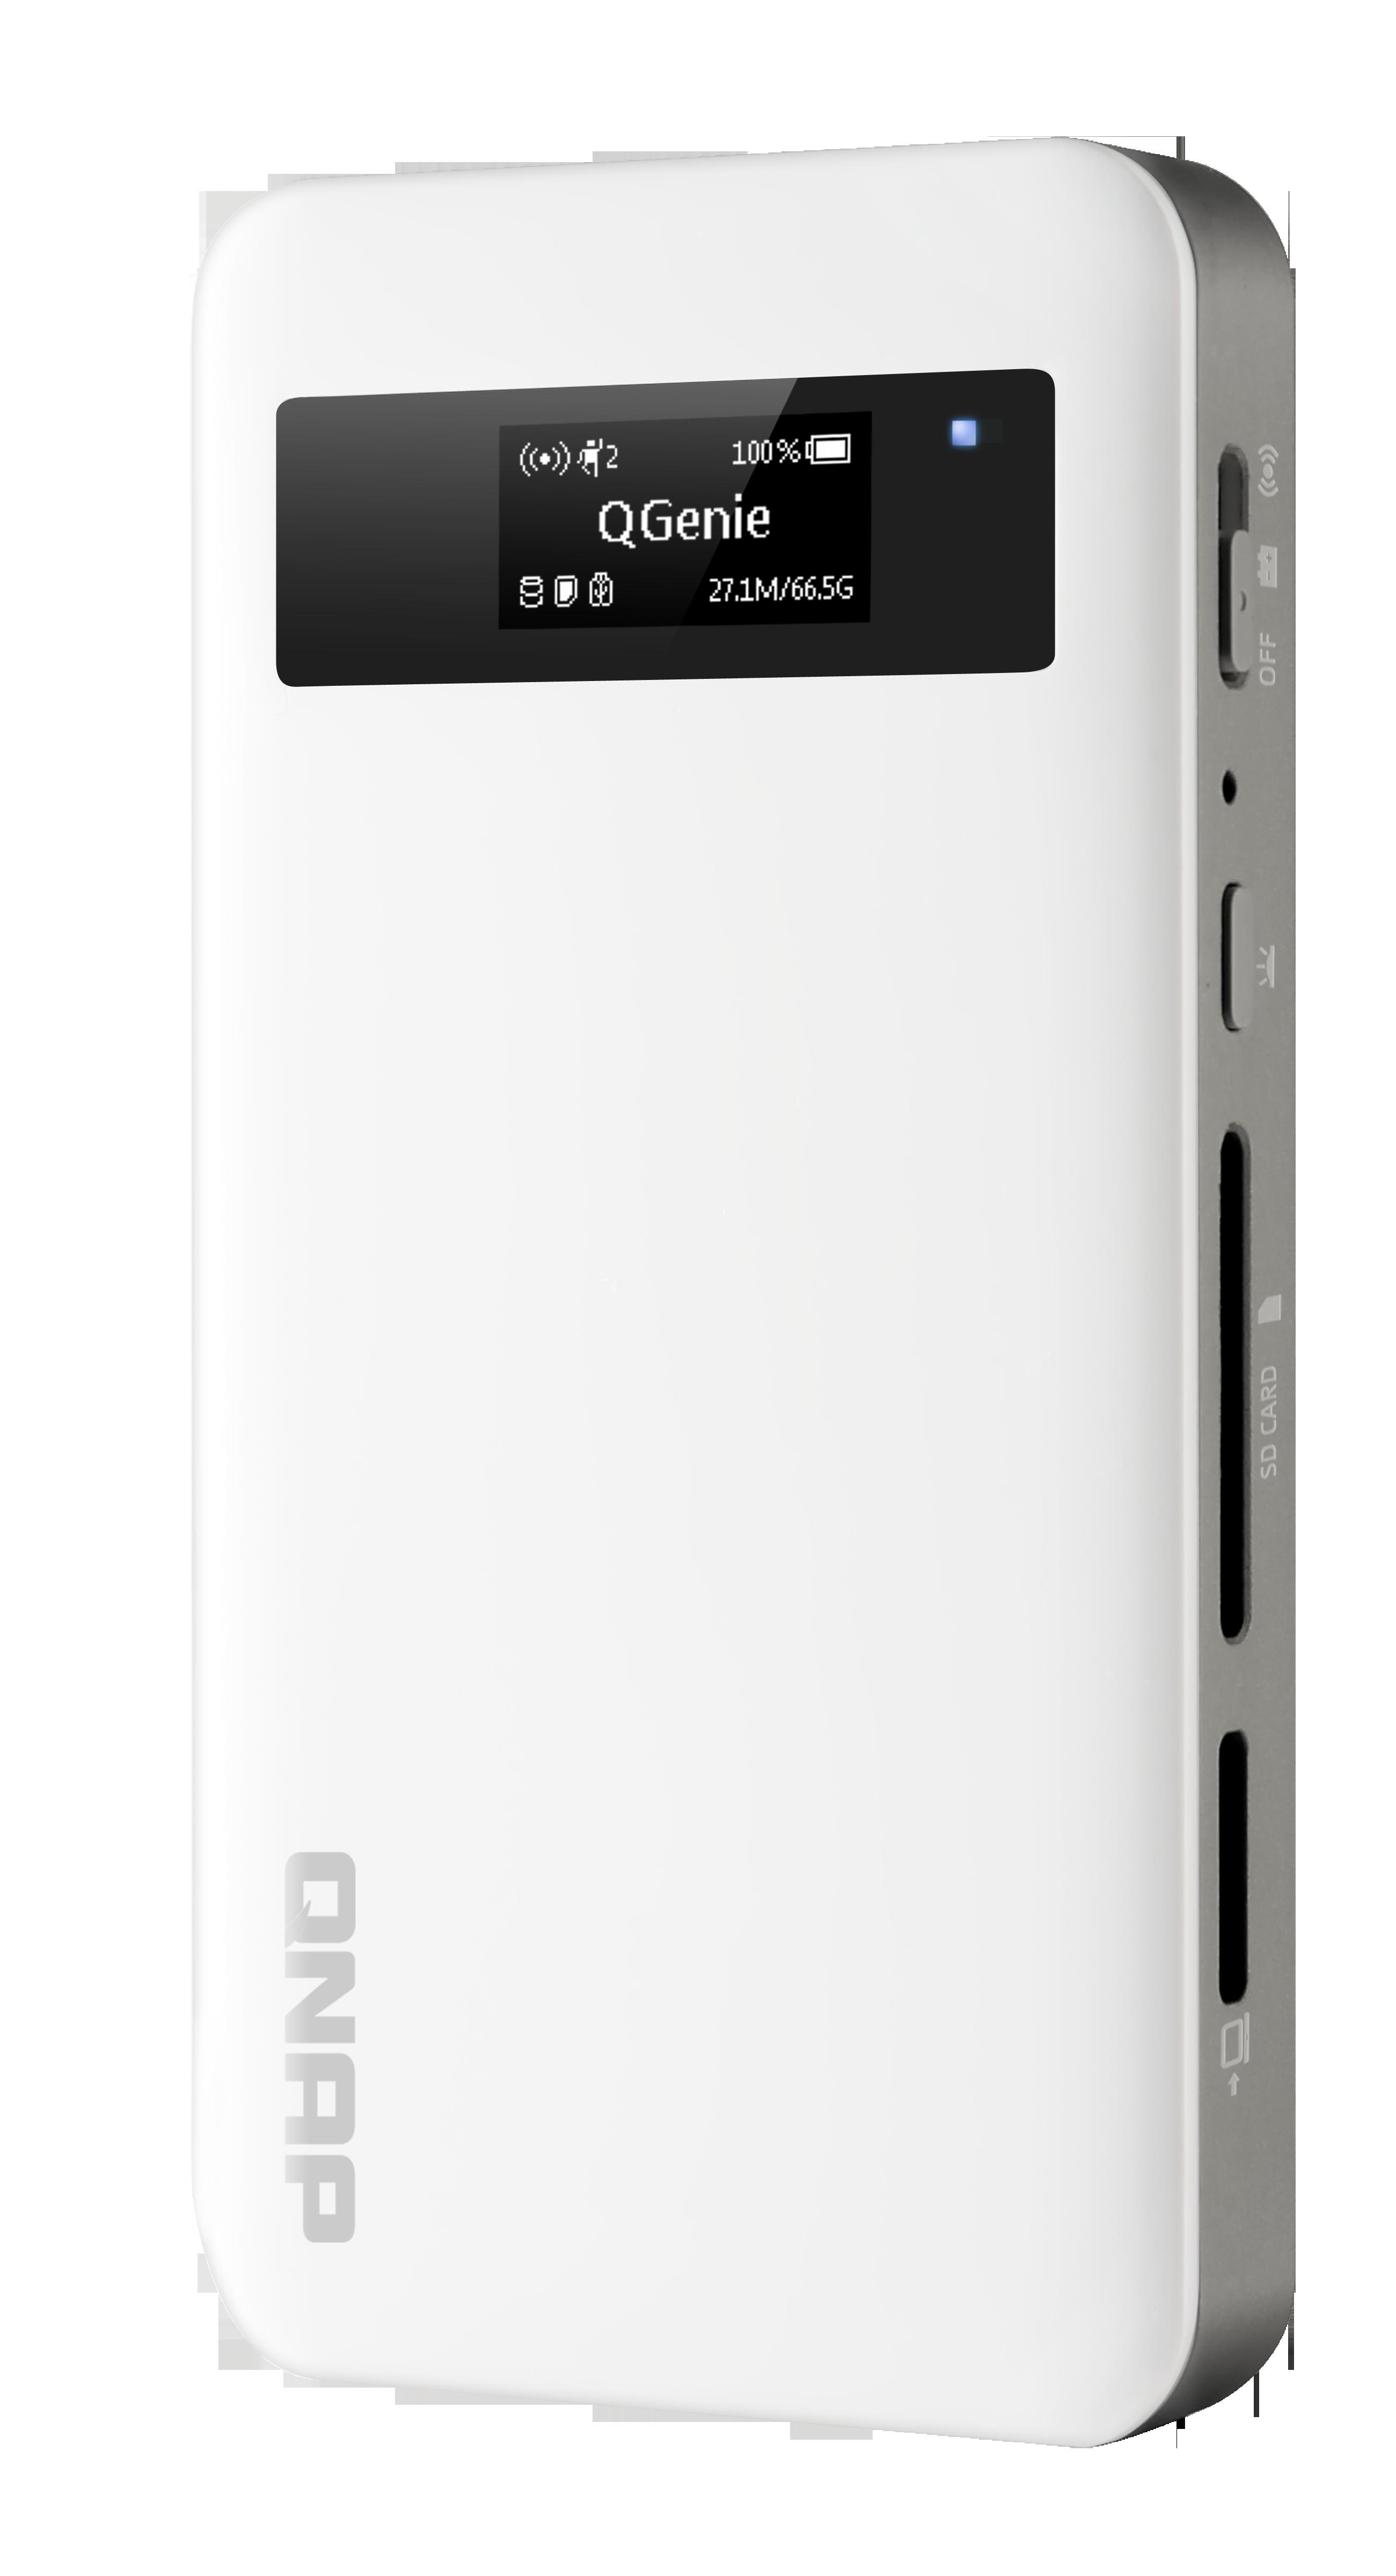 QNAP QG-103N (32GB/64MB RAM)